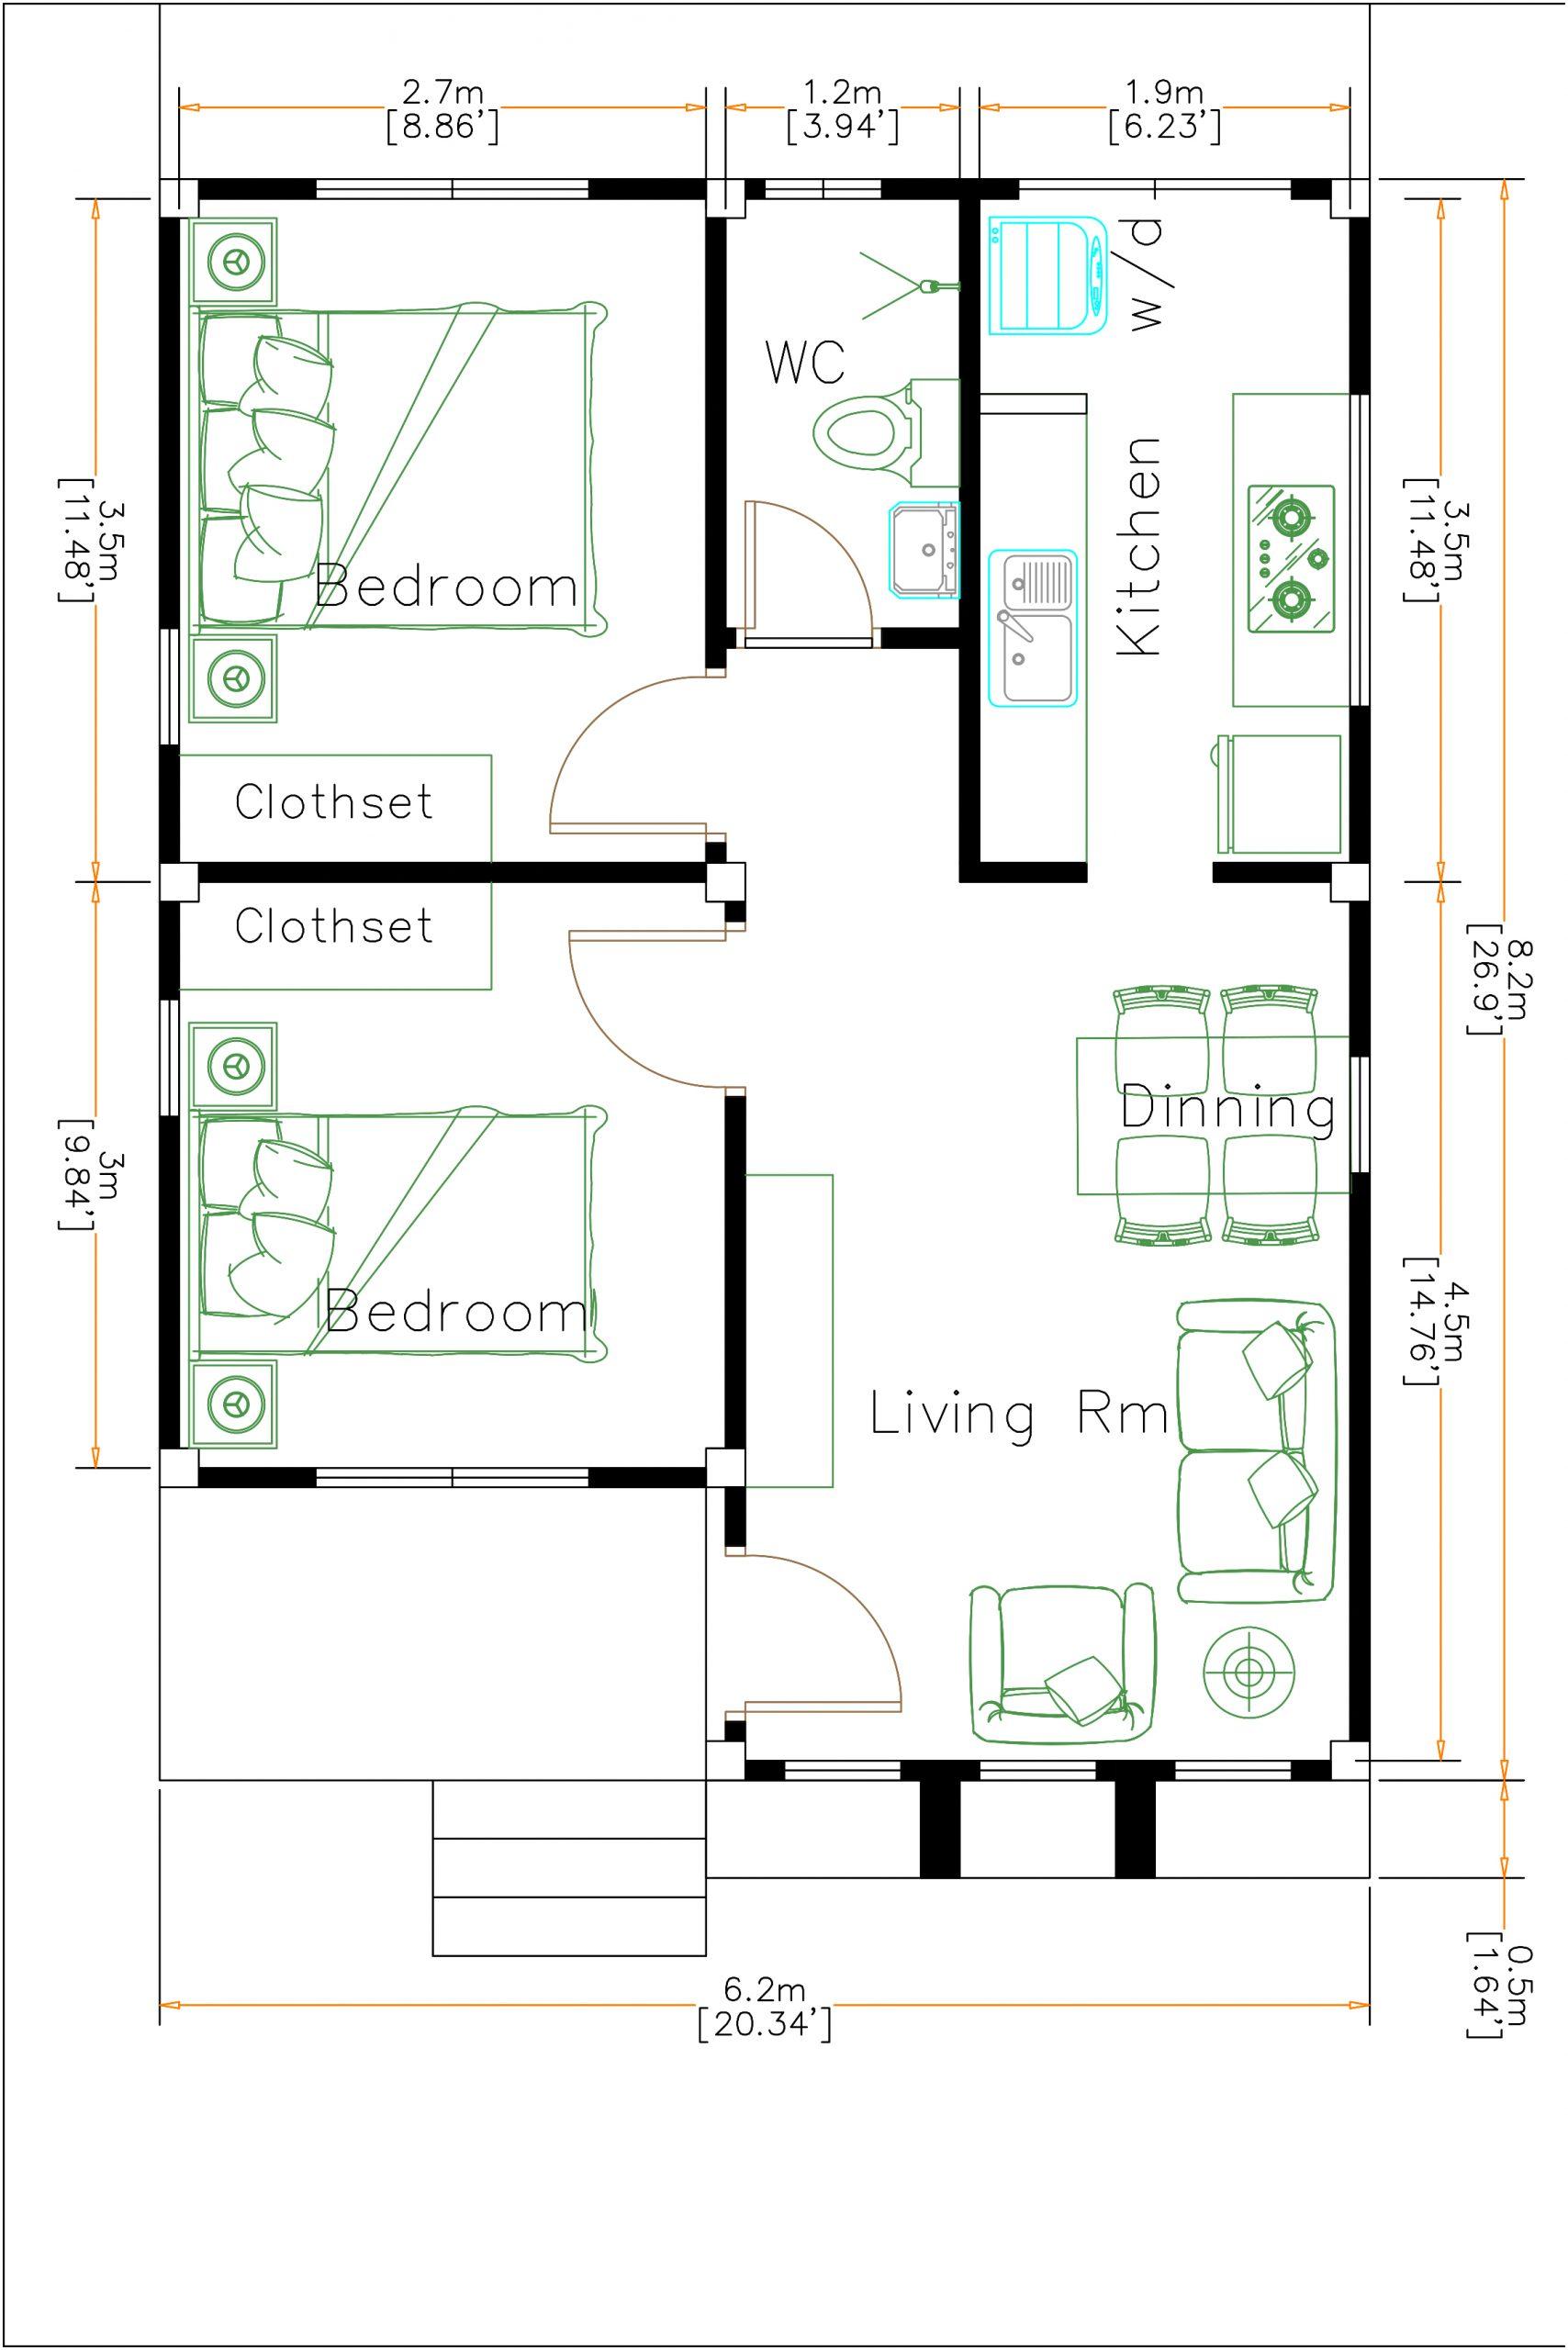 Best Small House Plans 6x8 Meter 20x27 Feet 2 Beds Layout floor plan